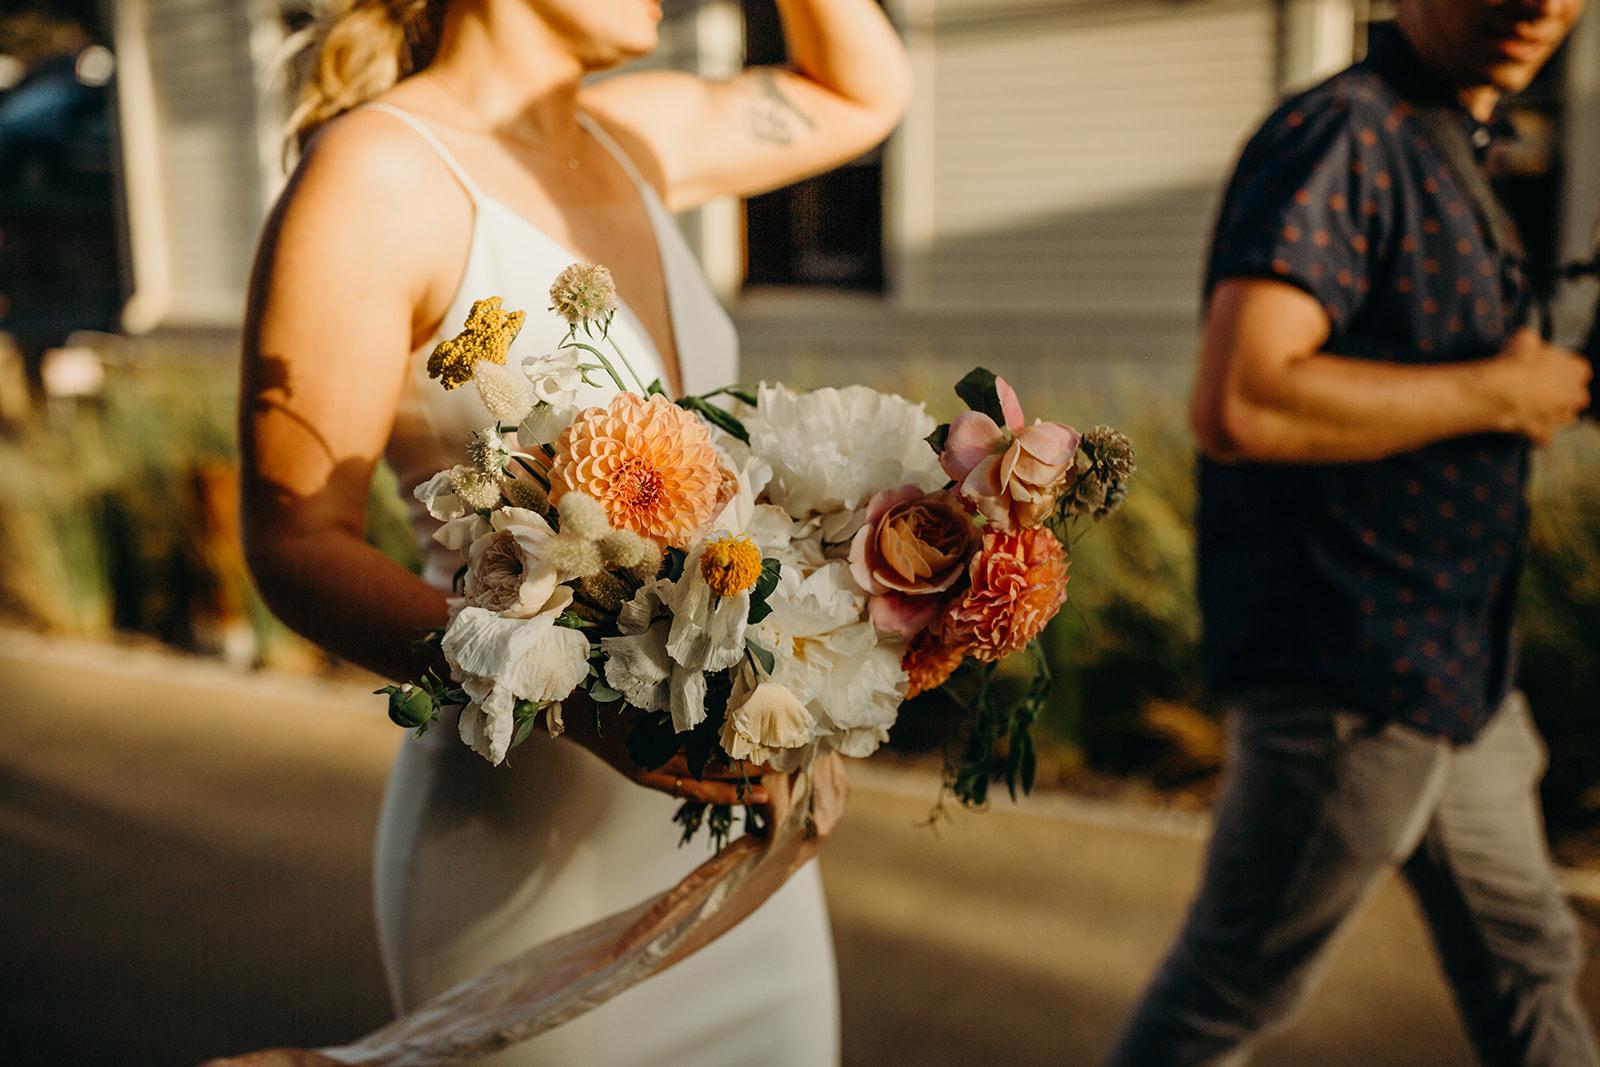 Whitney-Lauren-Headlands-Center-for-The-Arts-Wedding-1475_websize.jpg